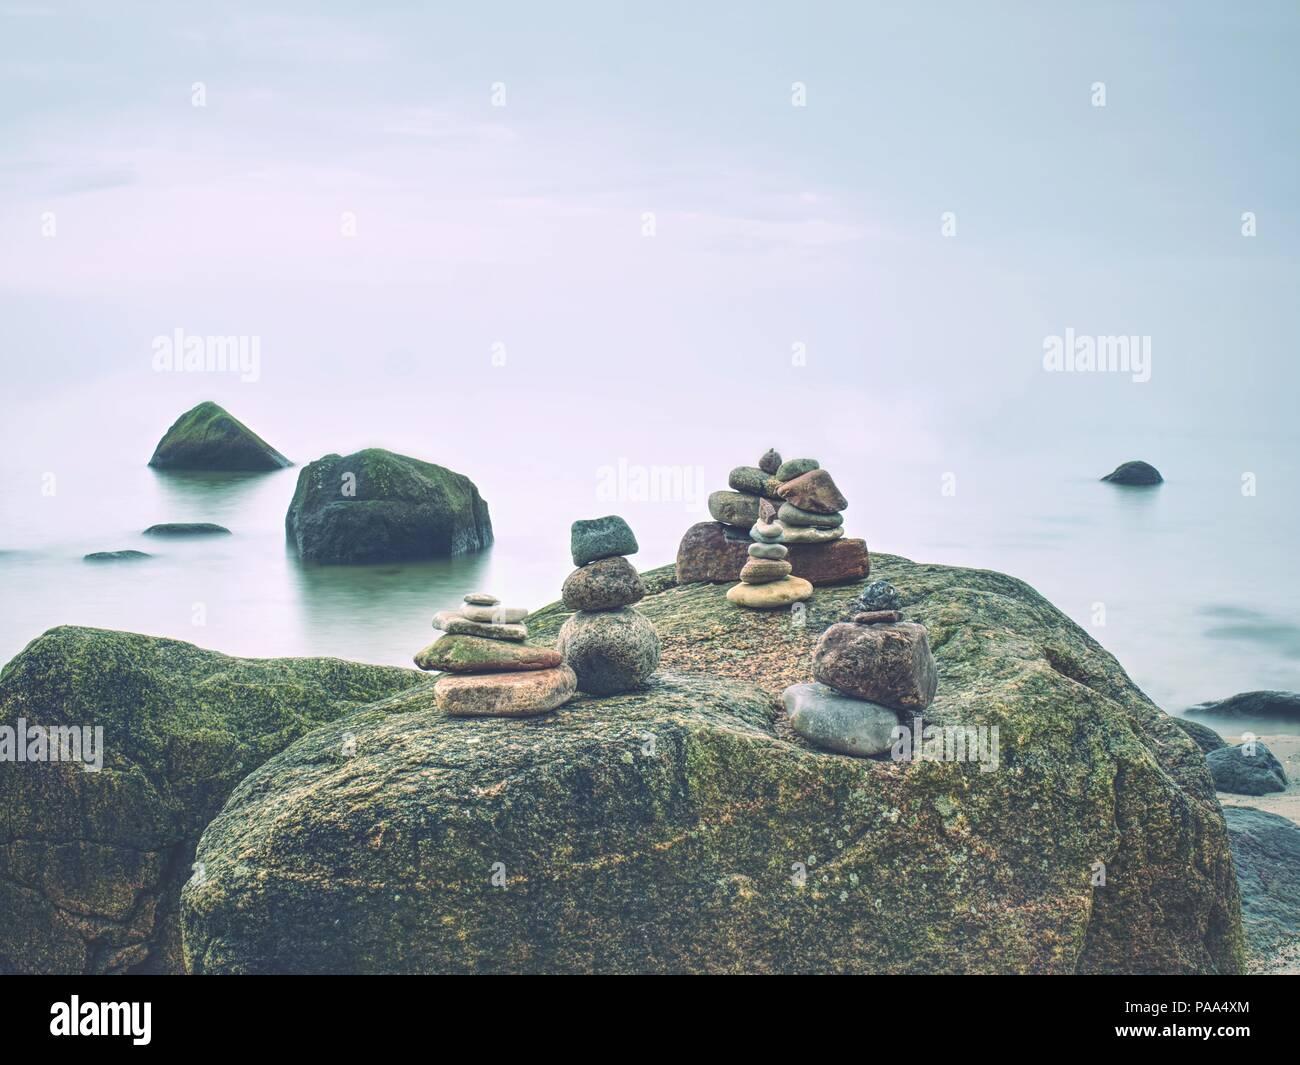 Stones pyramid symbolizing zen harmony balance pebbles. Peaceful ocean in background. Colorful flat stones for meditation. Stock Photo